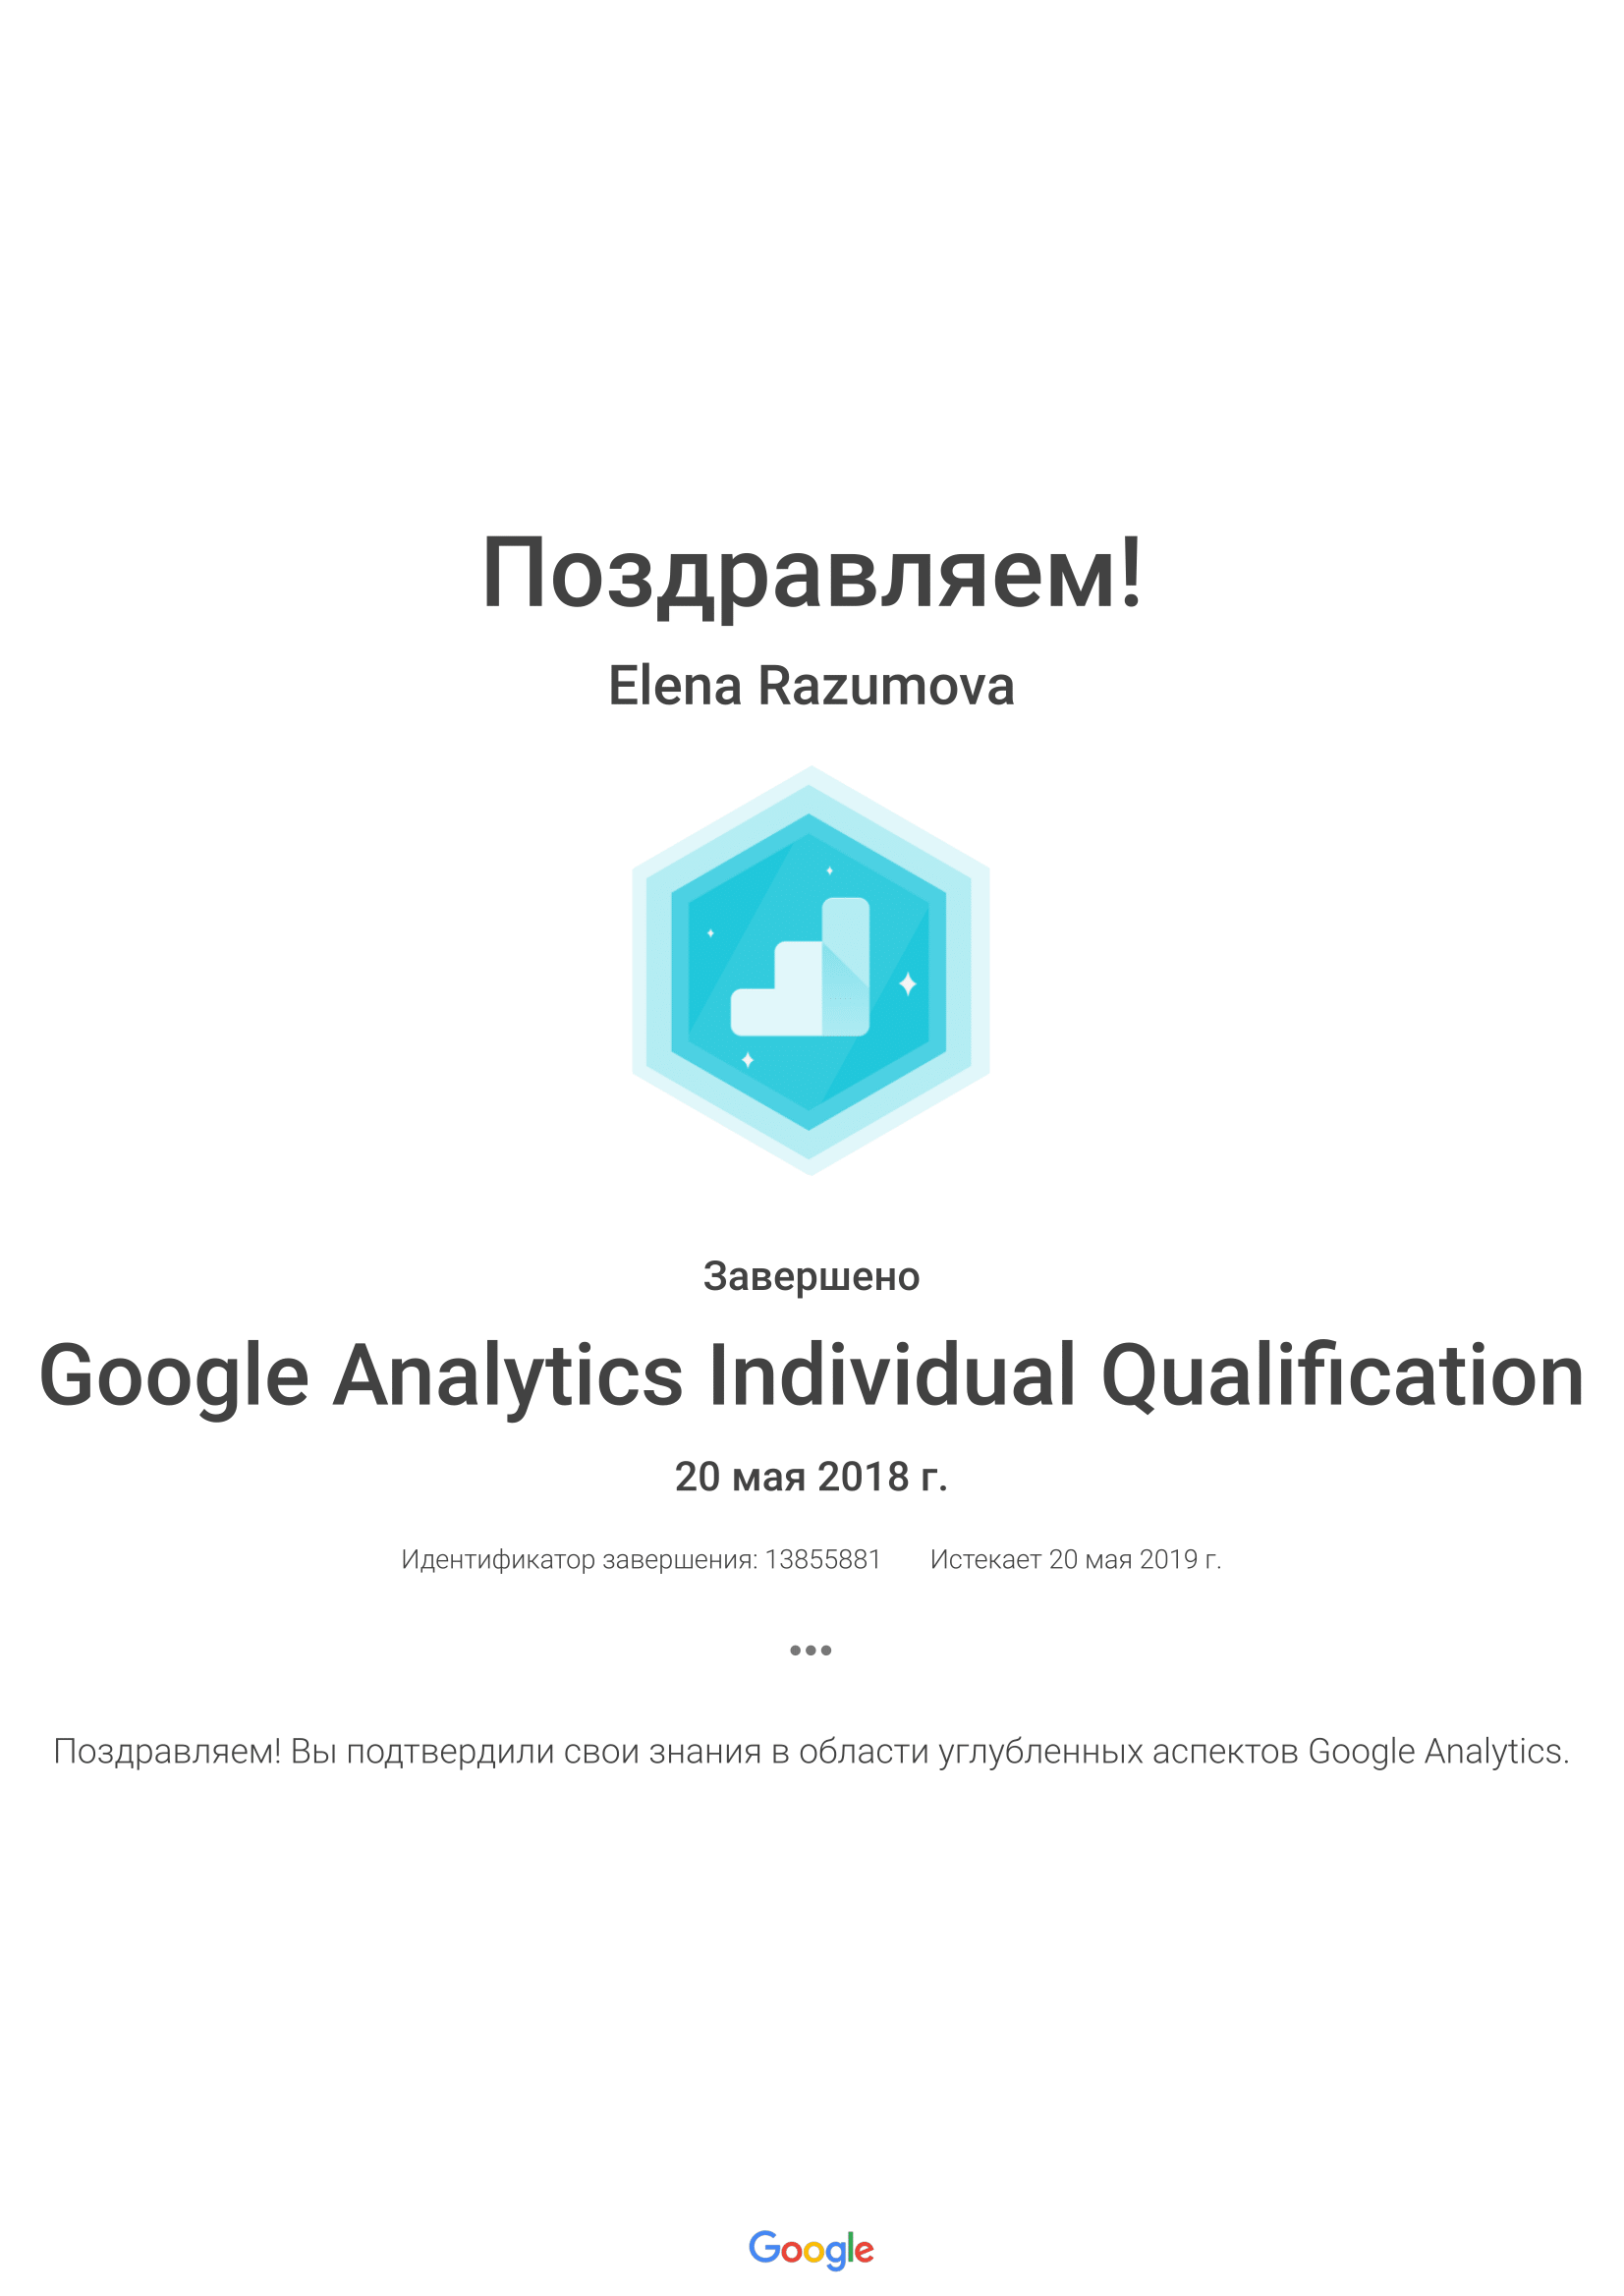 Elena elkris – Google Analytics